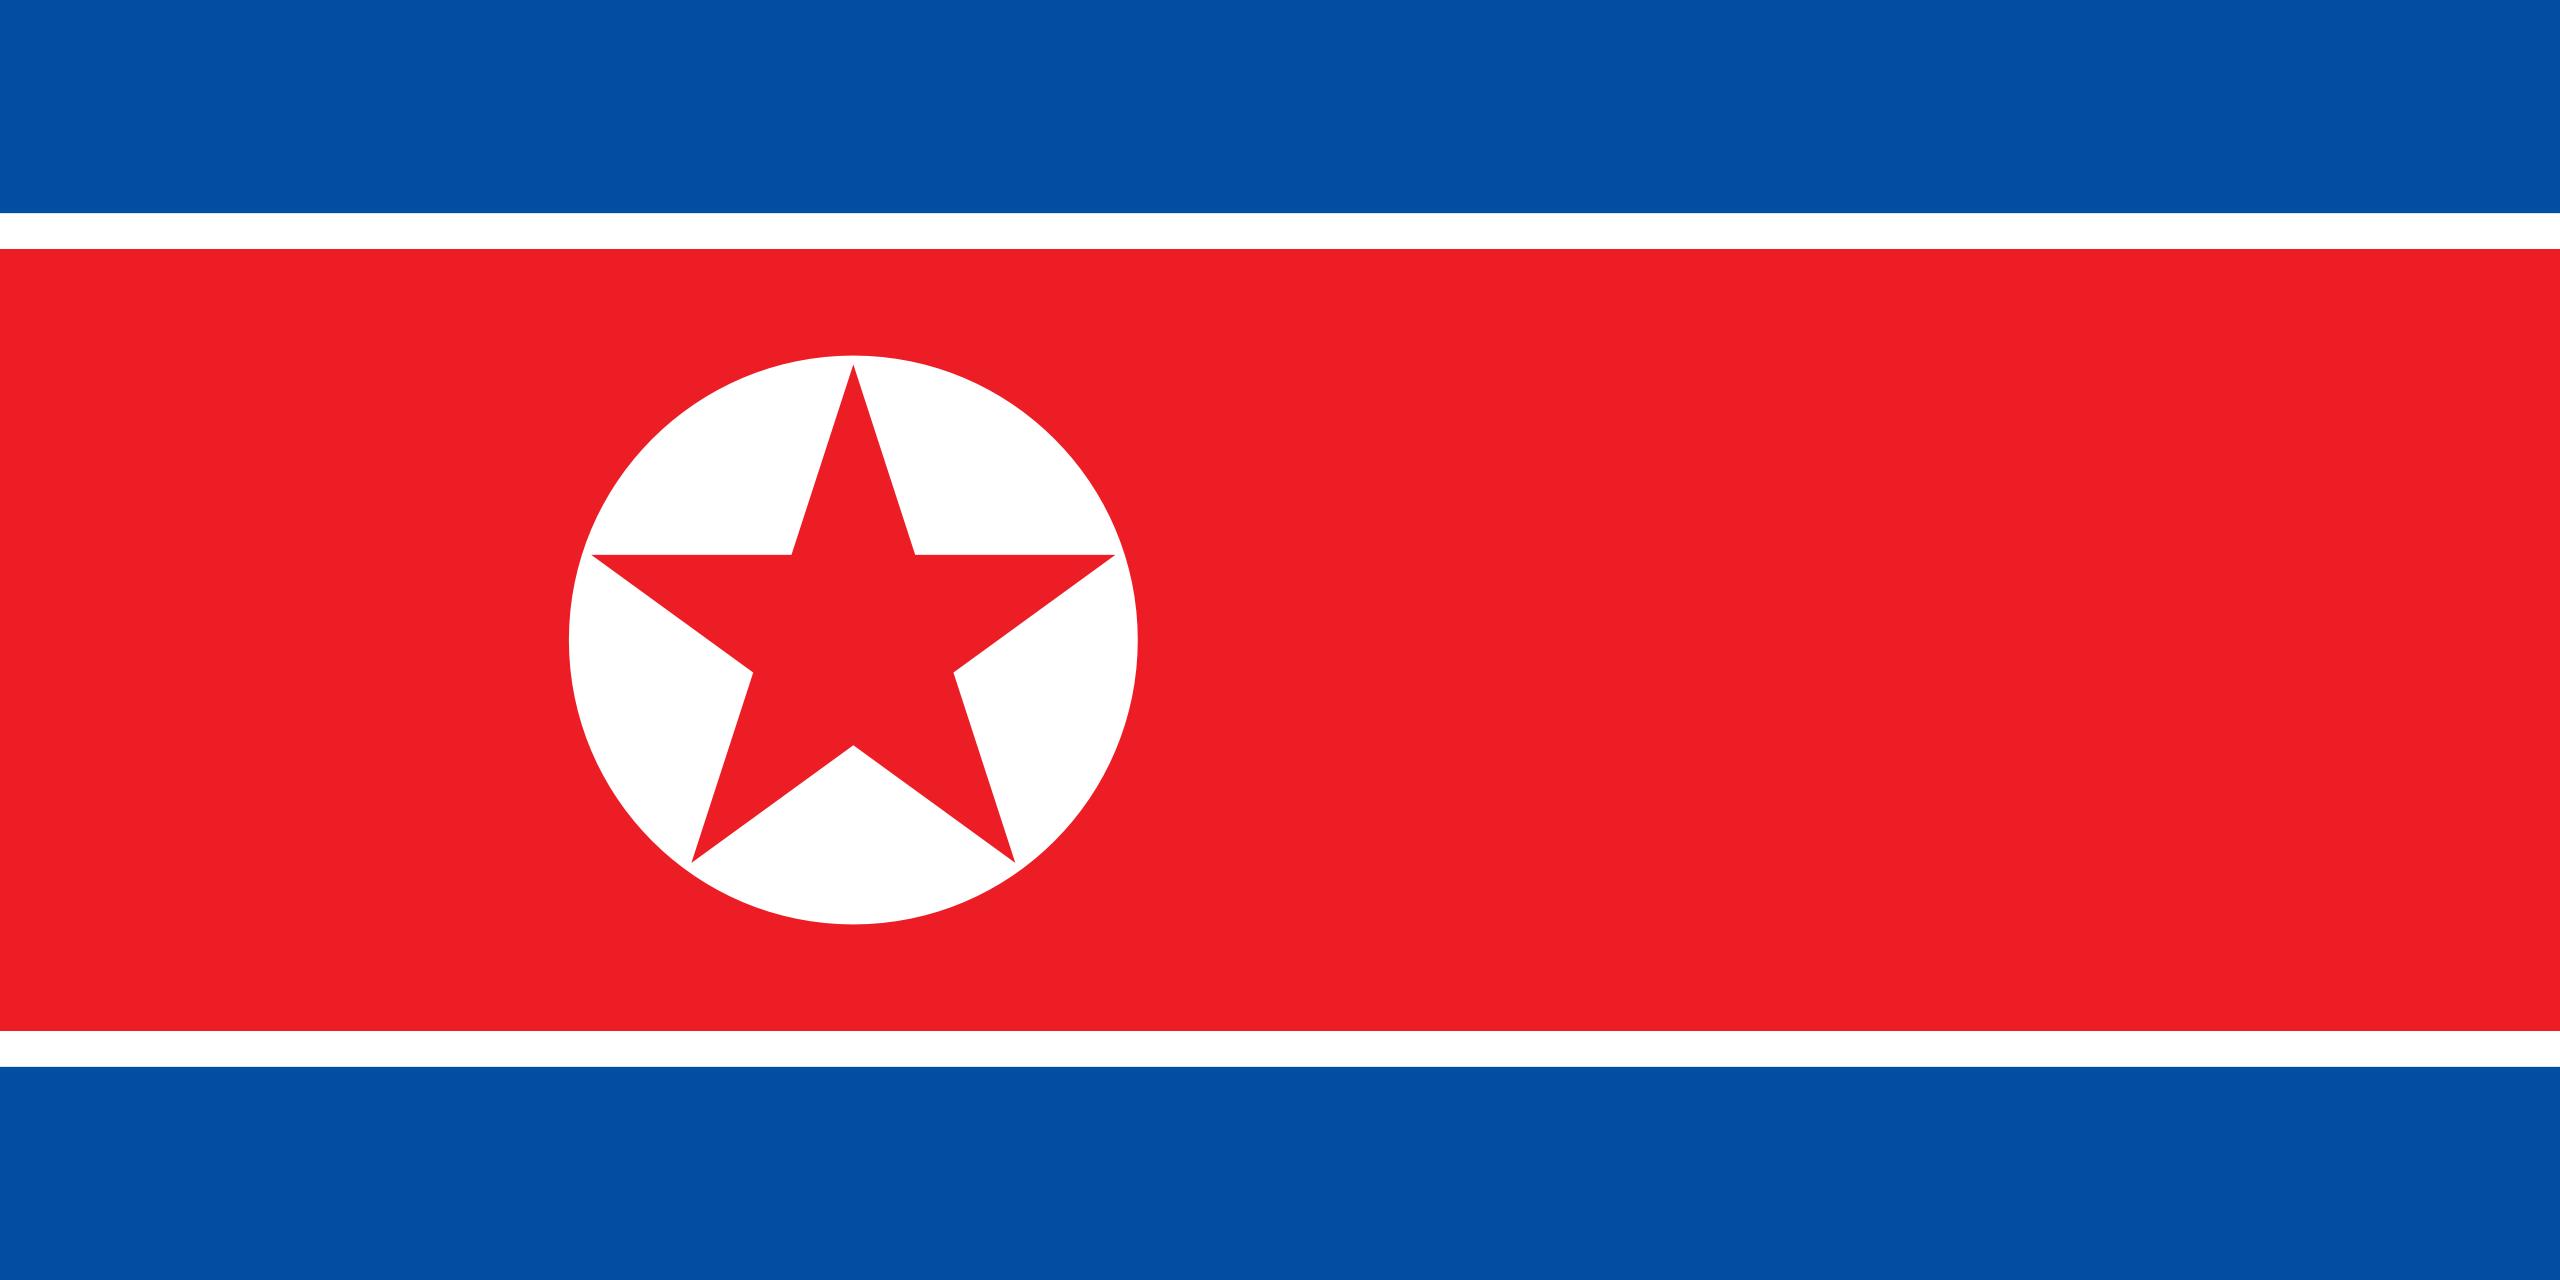 Corea del Nord, paese, emblema, logo, simbolo - Sfondi HD - Professor-falken.com